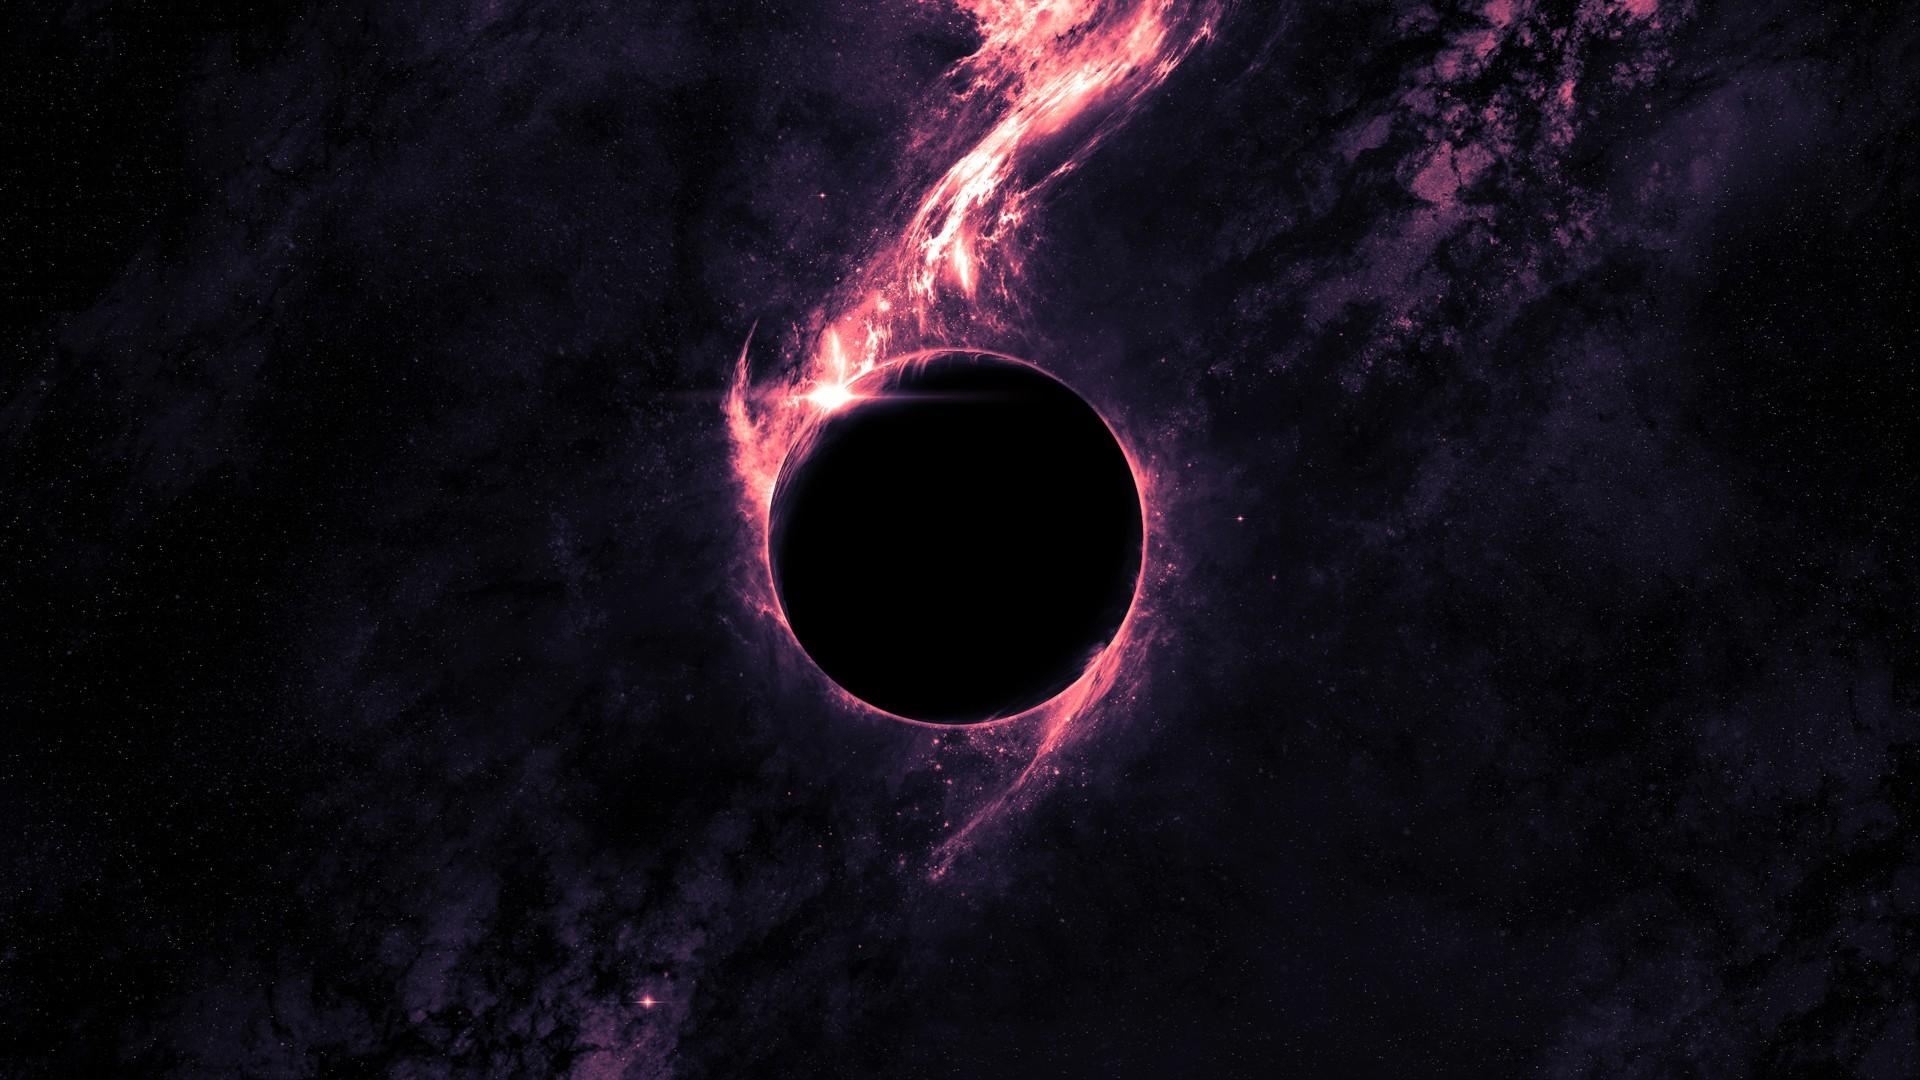 Black Planet Purple Nebula wallpaper